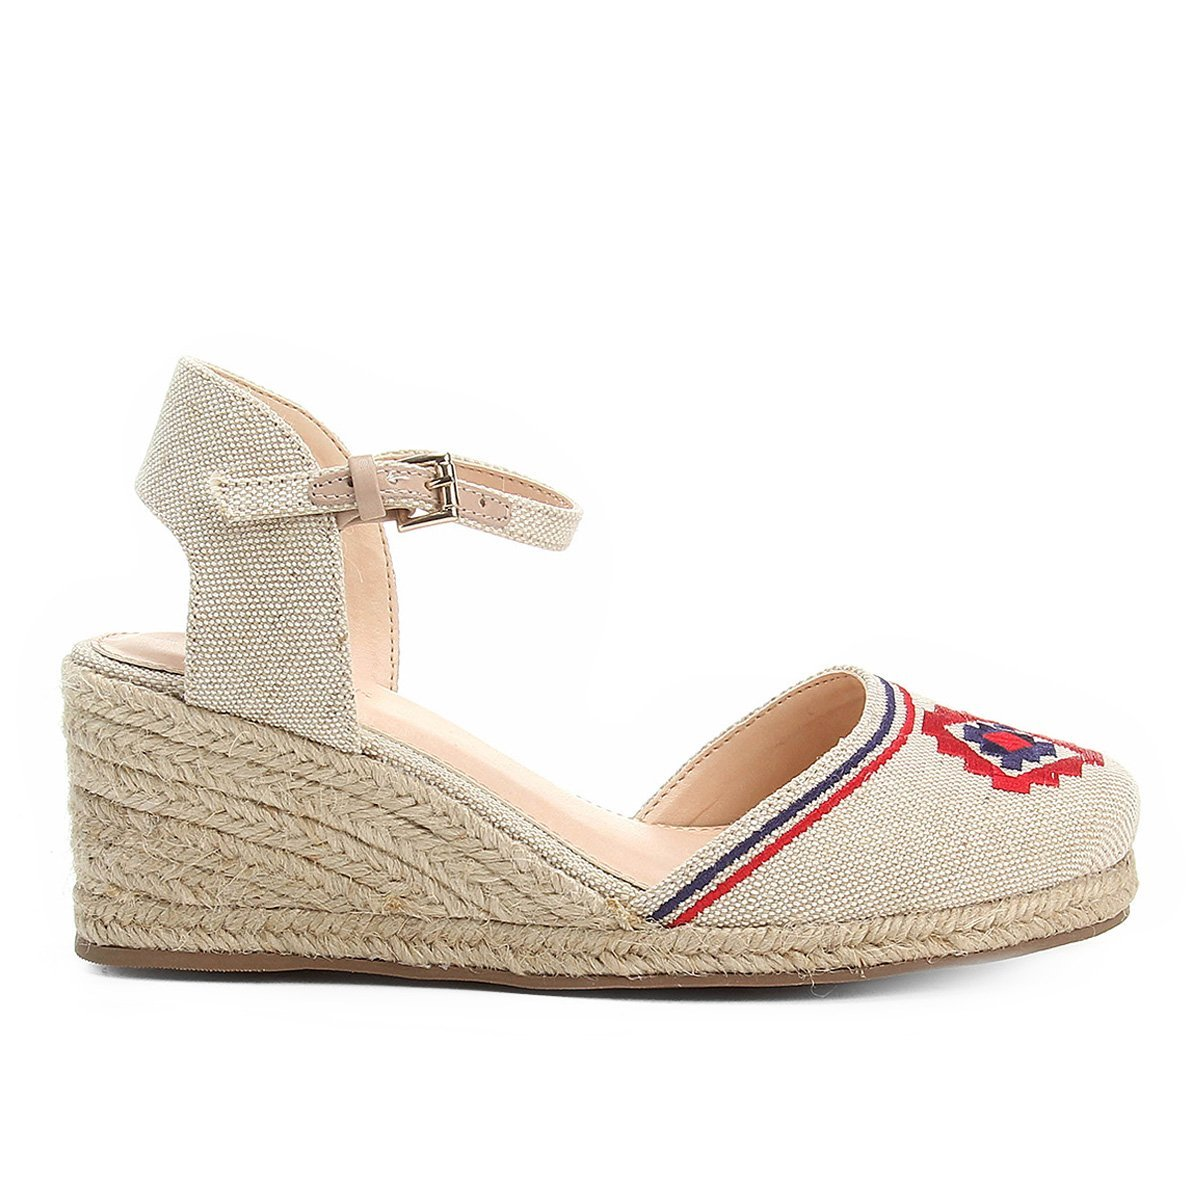 Espadrille Shoestock Shoestock Espadrille Anabela White Bordada Feminina Off rwr4STqHx